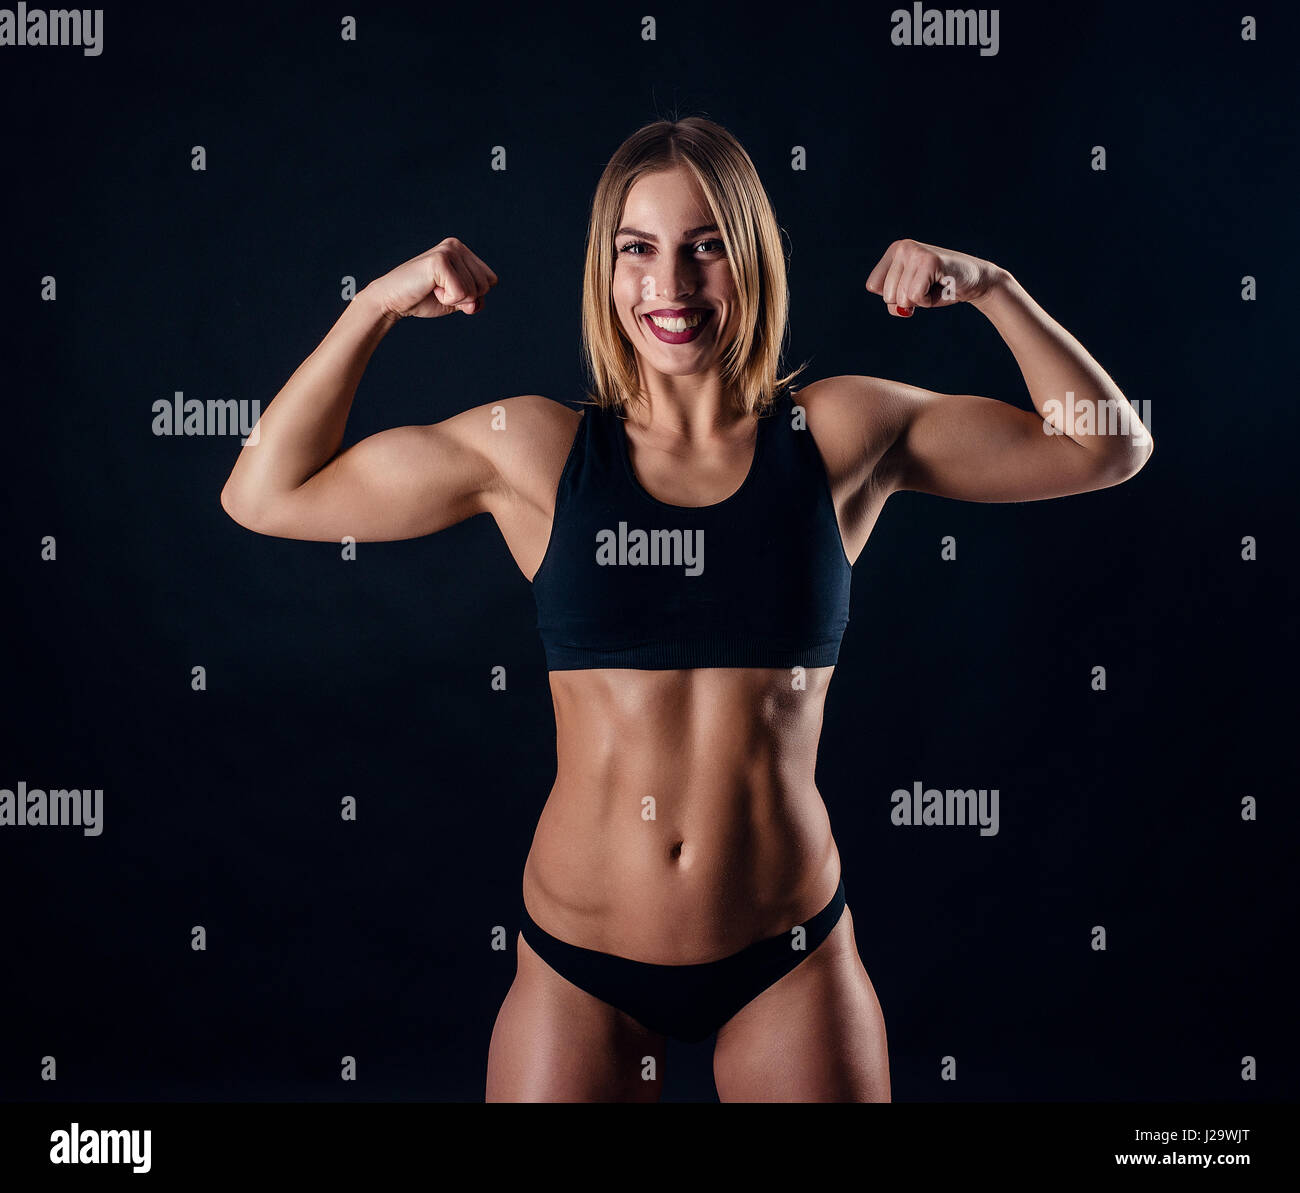 Muskulös frau Sportsucht: Wenn